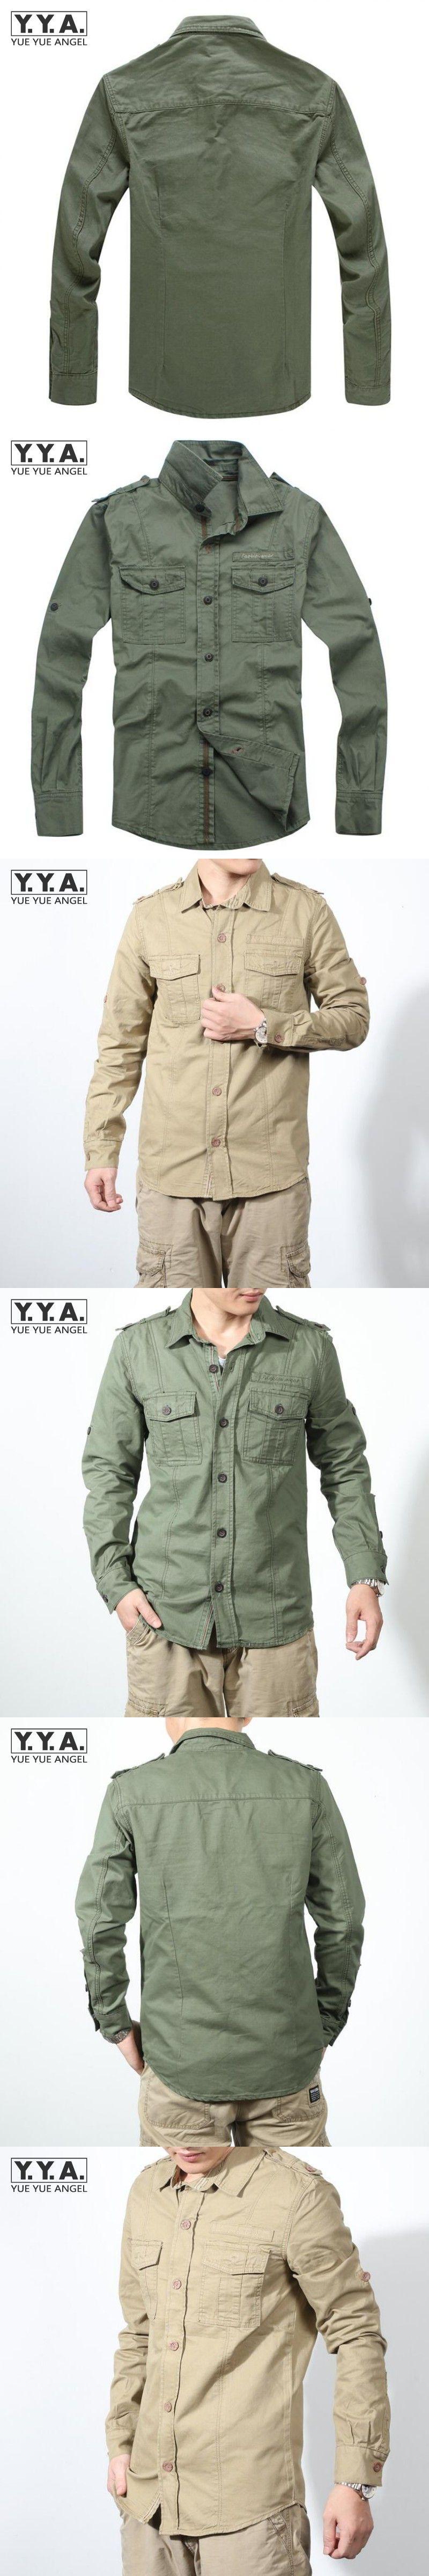 6aa7fa2cba Casual Slim Fit Men s Cotton Khaki Cargo Shirts Jean Military Style Long  Sleeve Shirt Multi-